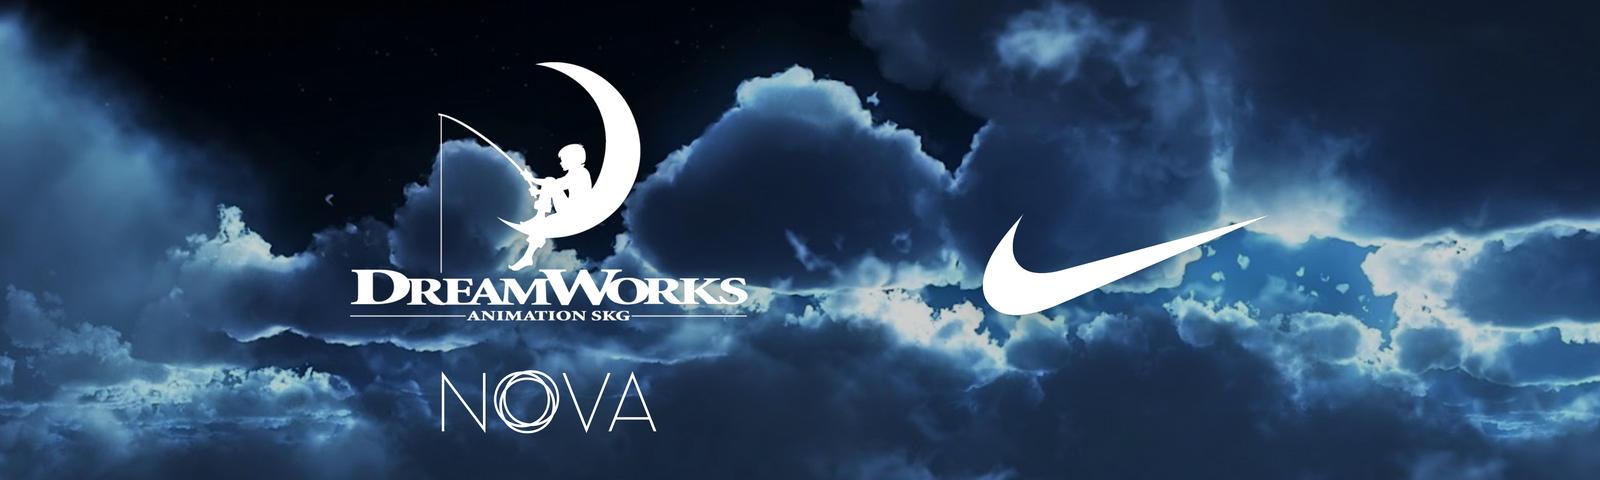 Nike_DreamWorks_NOVA_native_1600